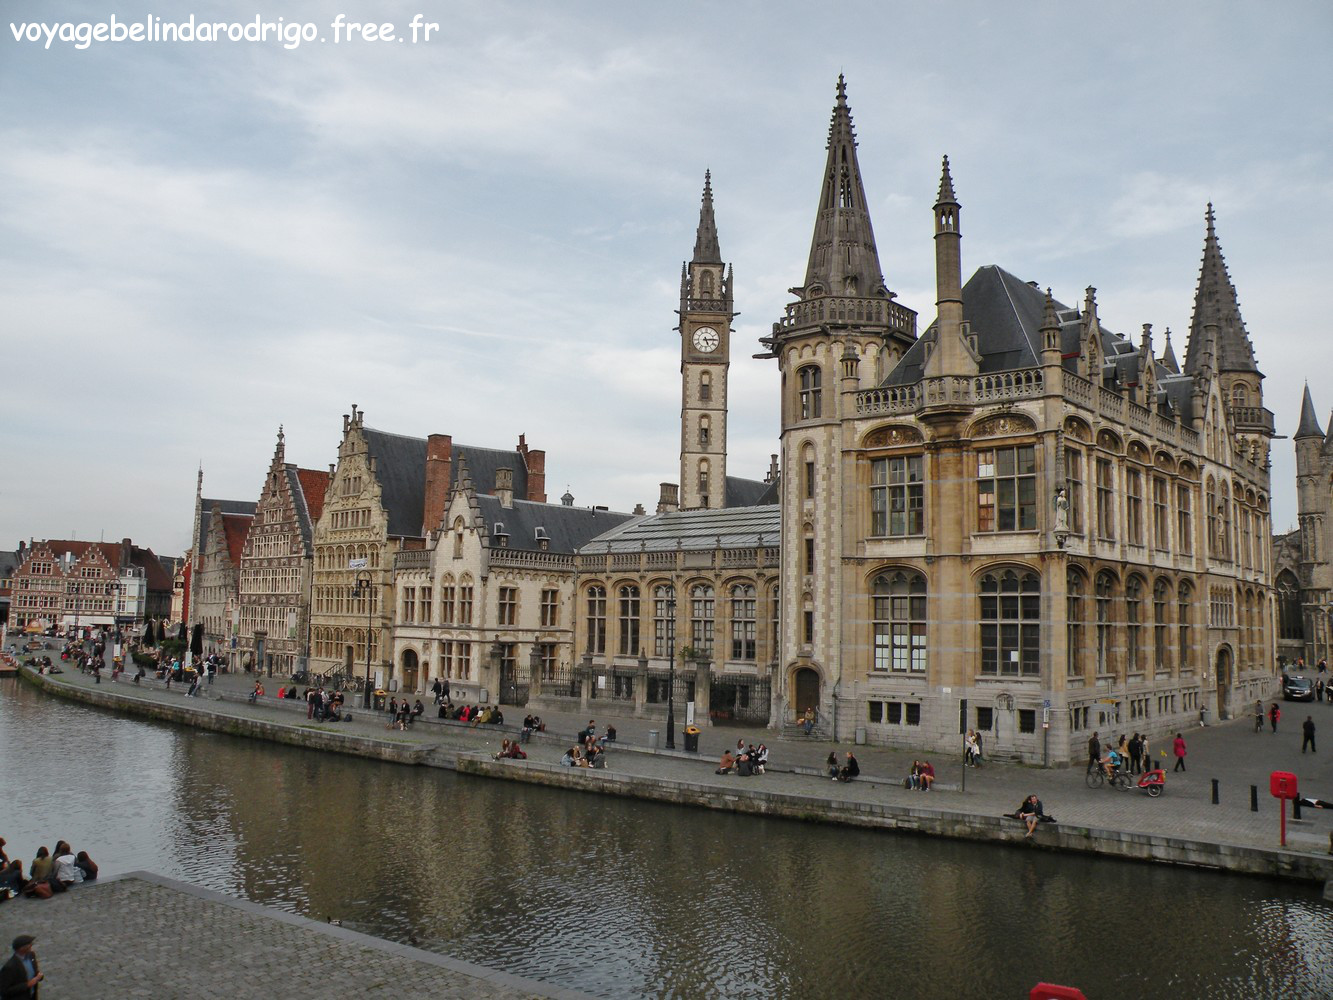 Quai aux Herbes - Canal Handelsdok - Gand